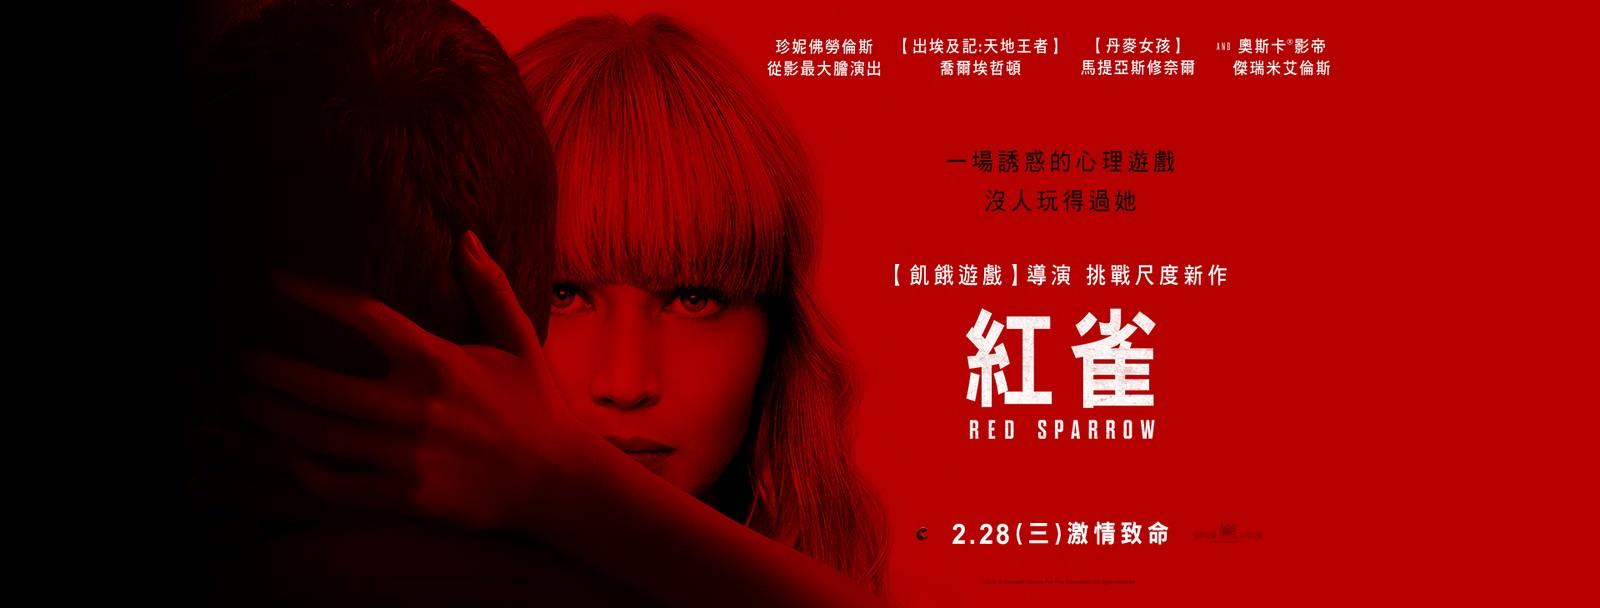 Movie, Red Sparrow(美國) / 紅雀(台) / 红雀特工(港), 電影海報, 台灣, 橫版